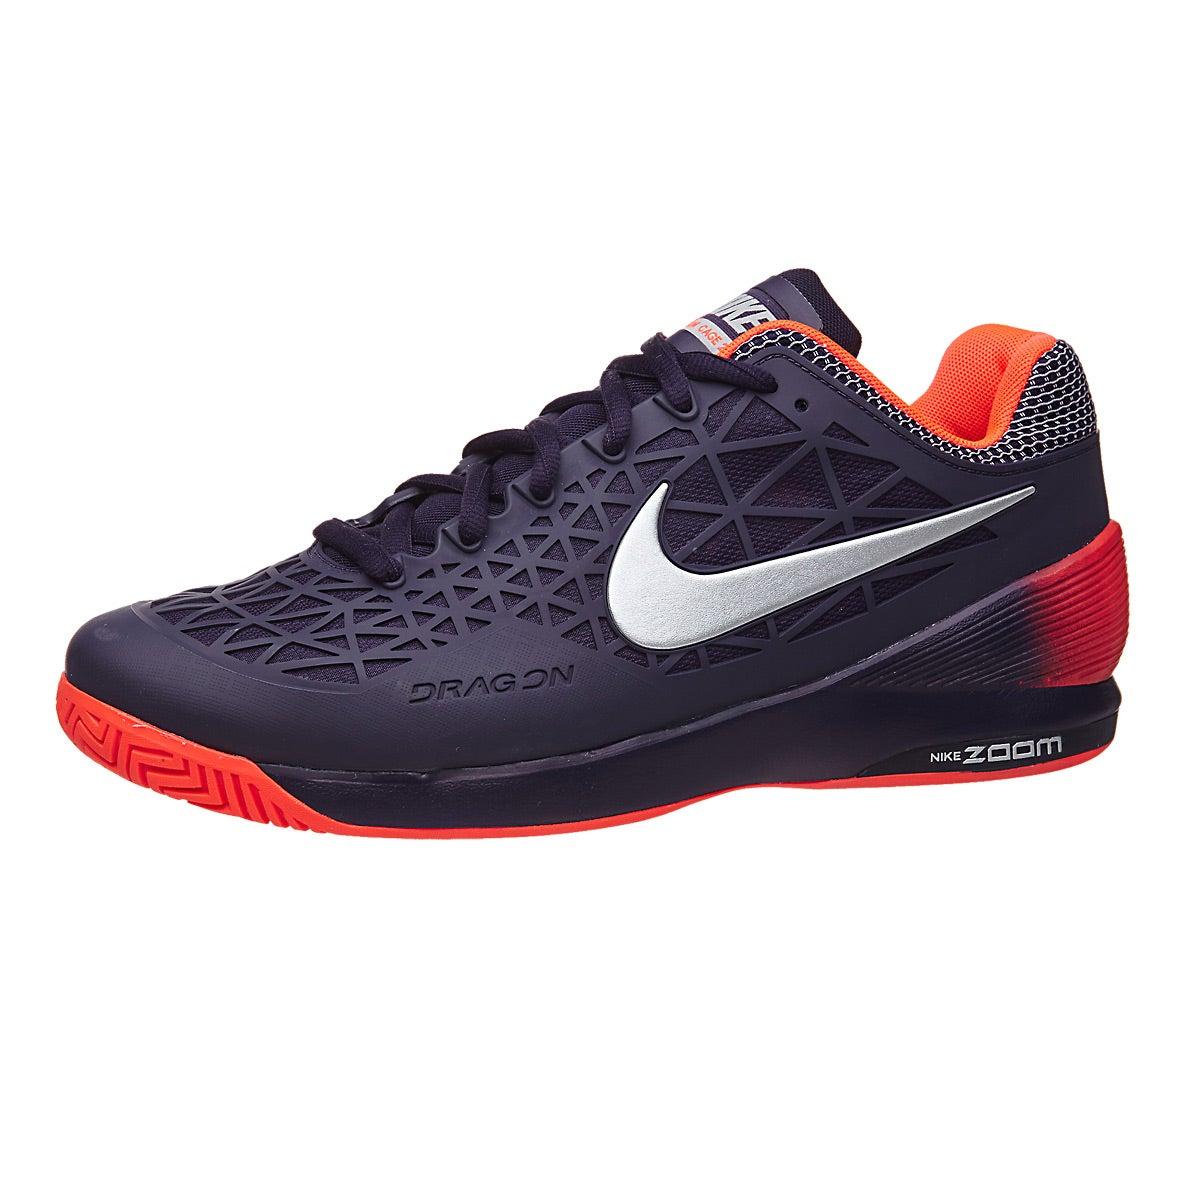 sports shoes fe805 a3a03 ... italy winflo 2 black orange white nike zoom cage 2 purple crimson silver  . e1ee5 e214f